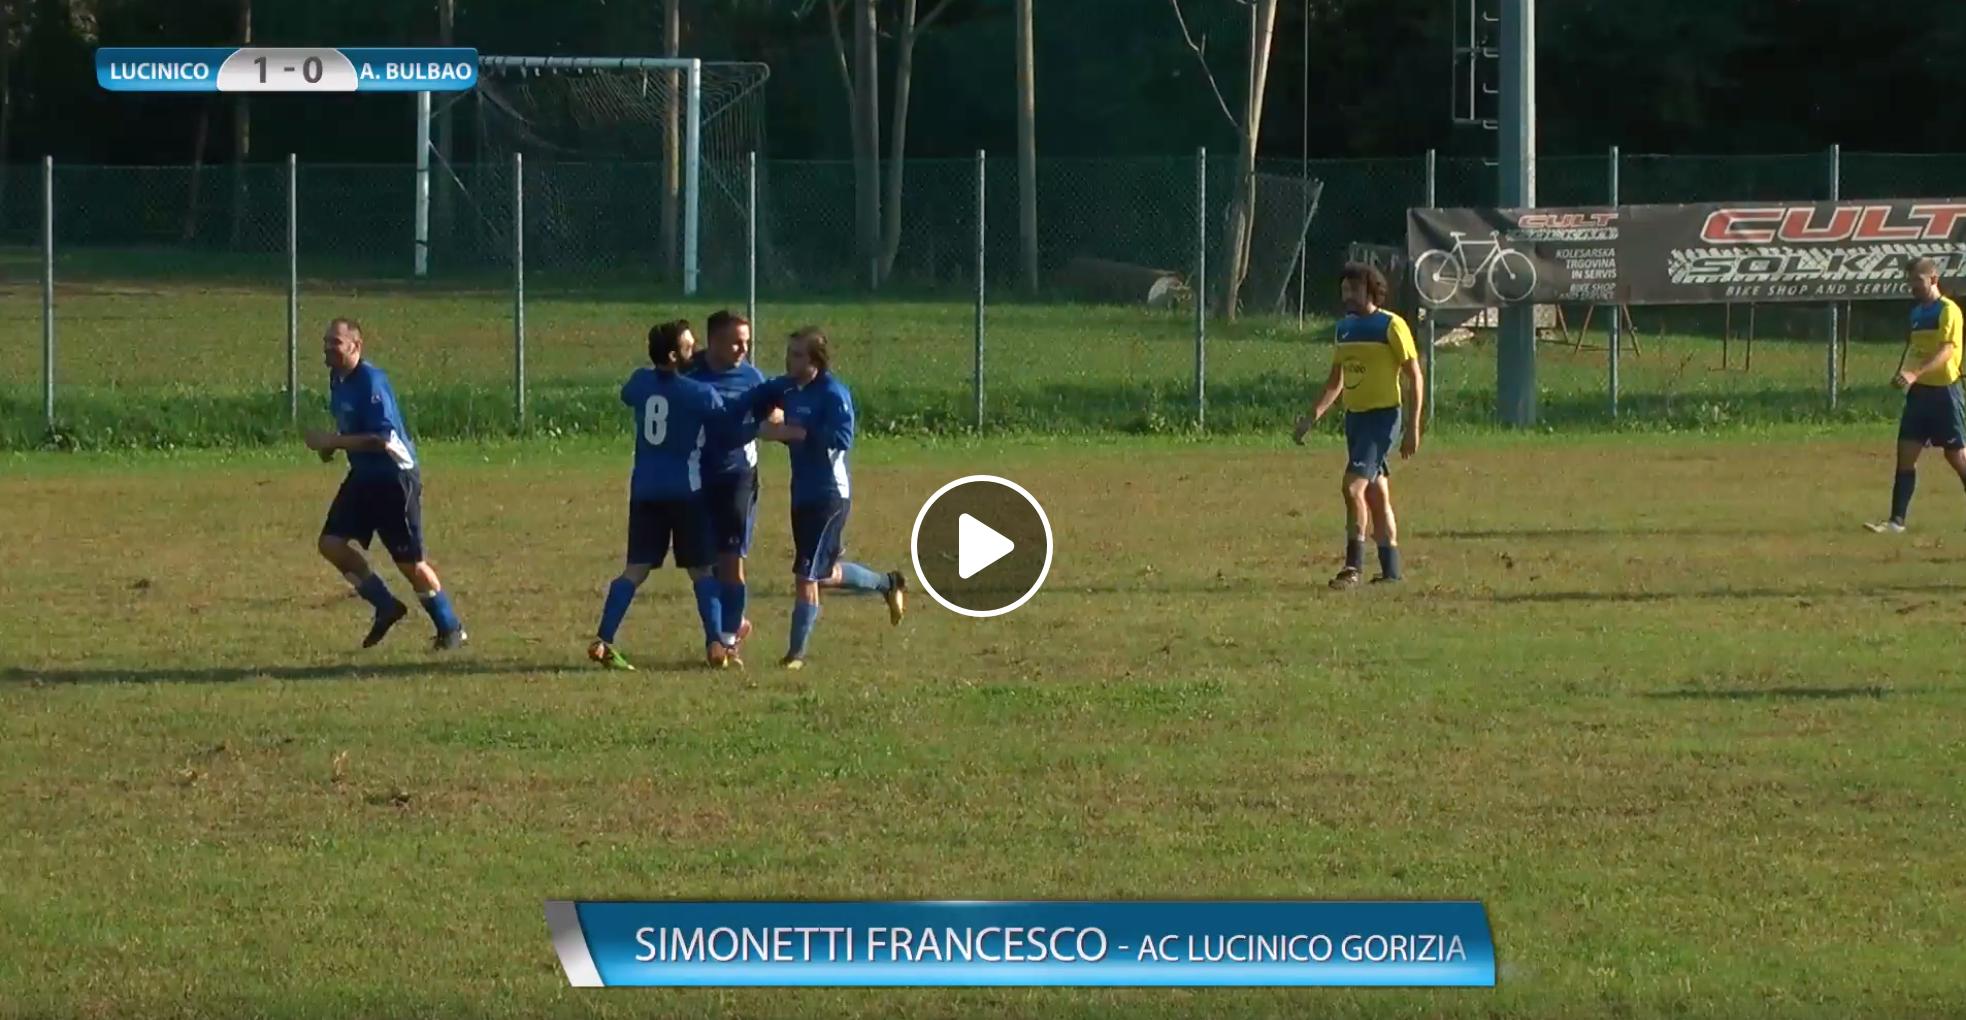 Video: AC Lucinico Gorizia - AC Atletico Bulbao